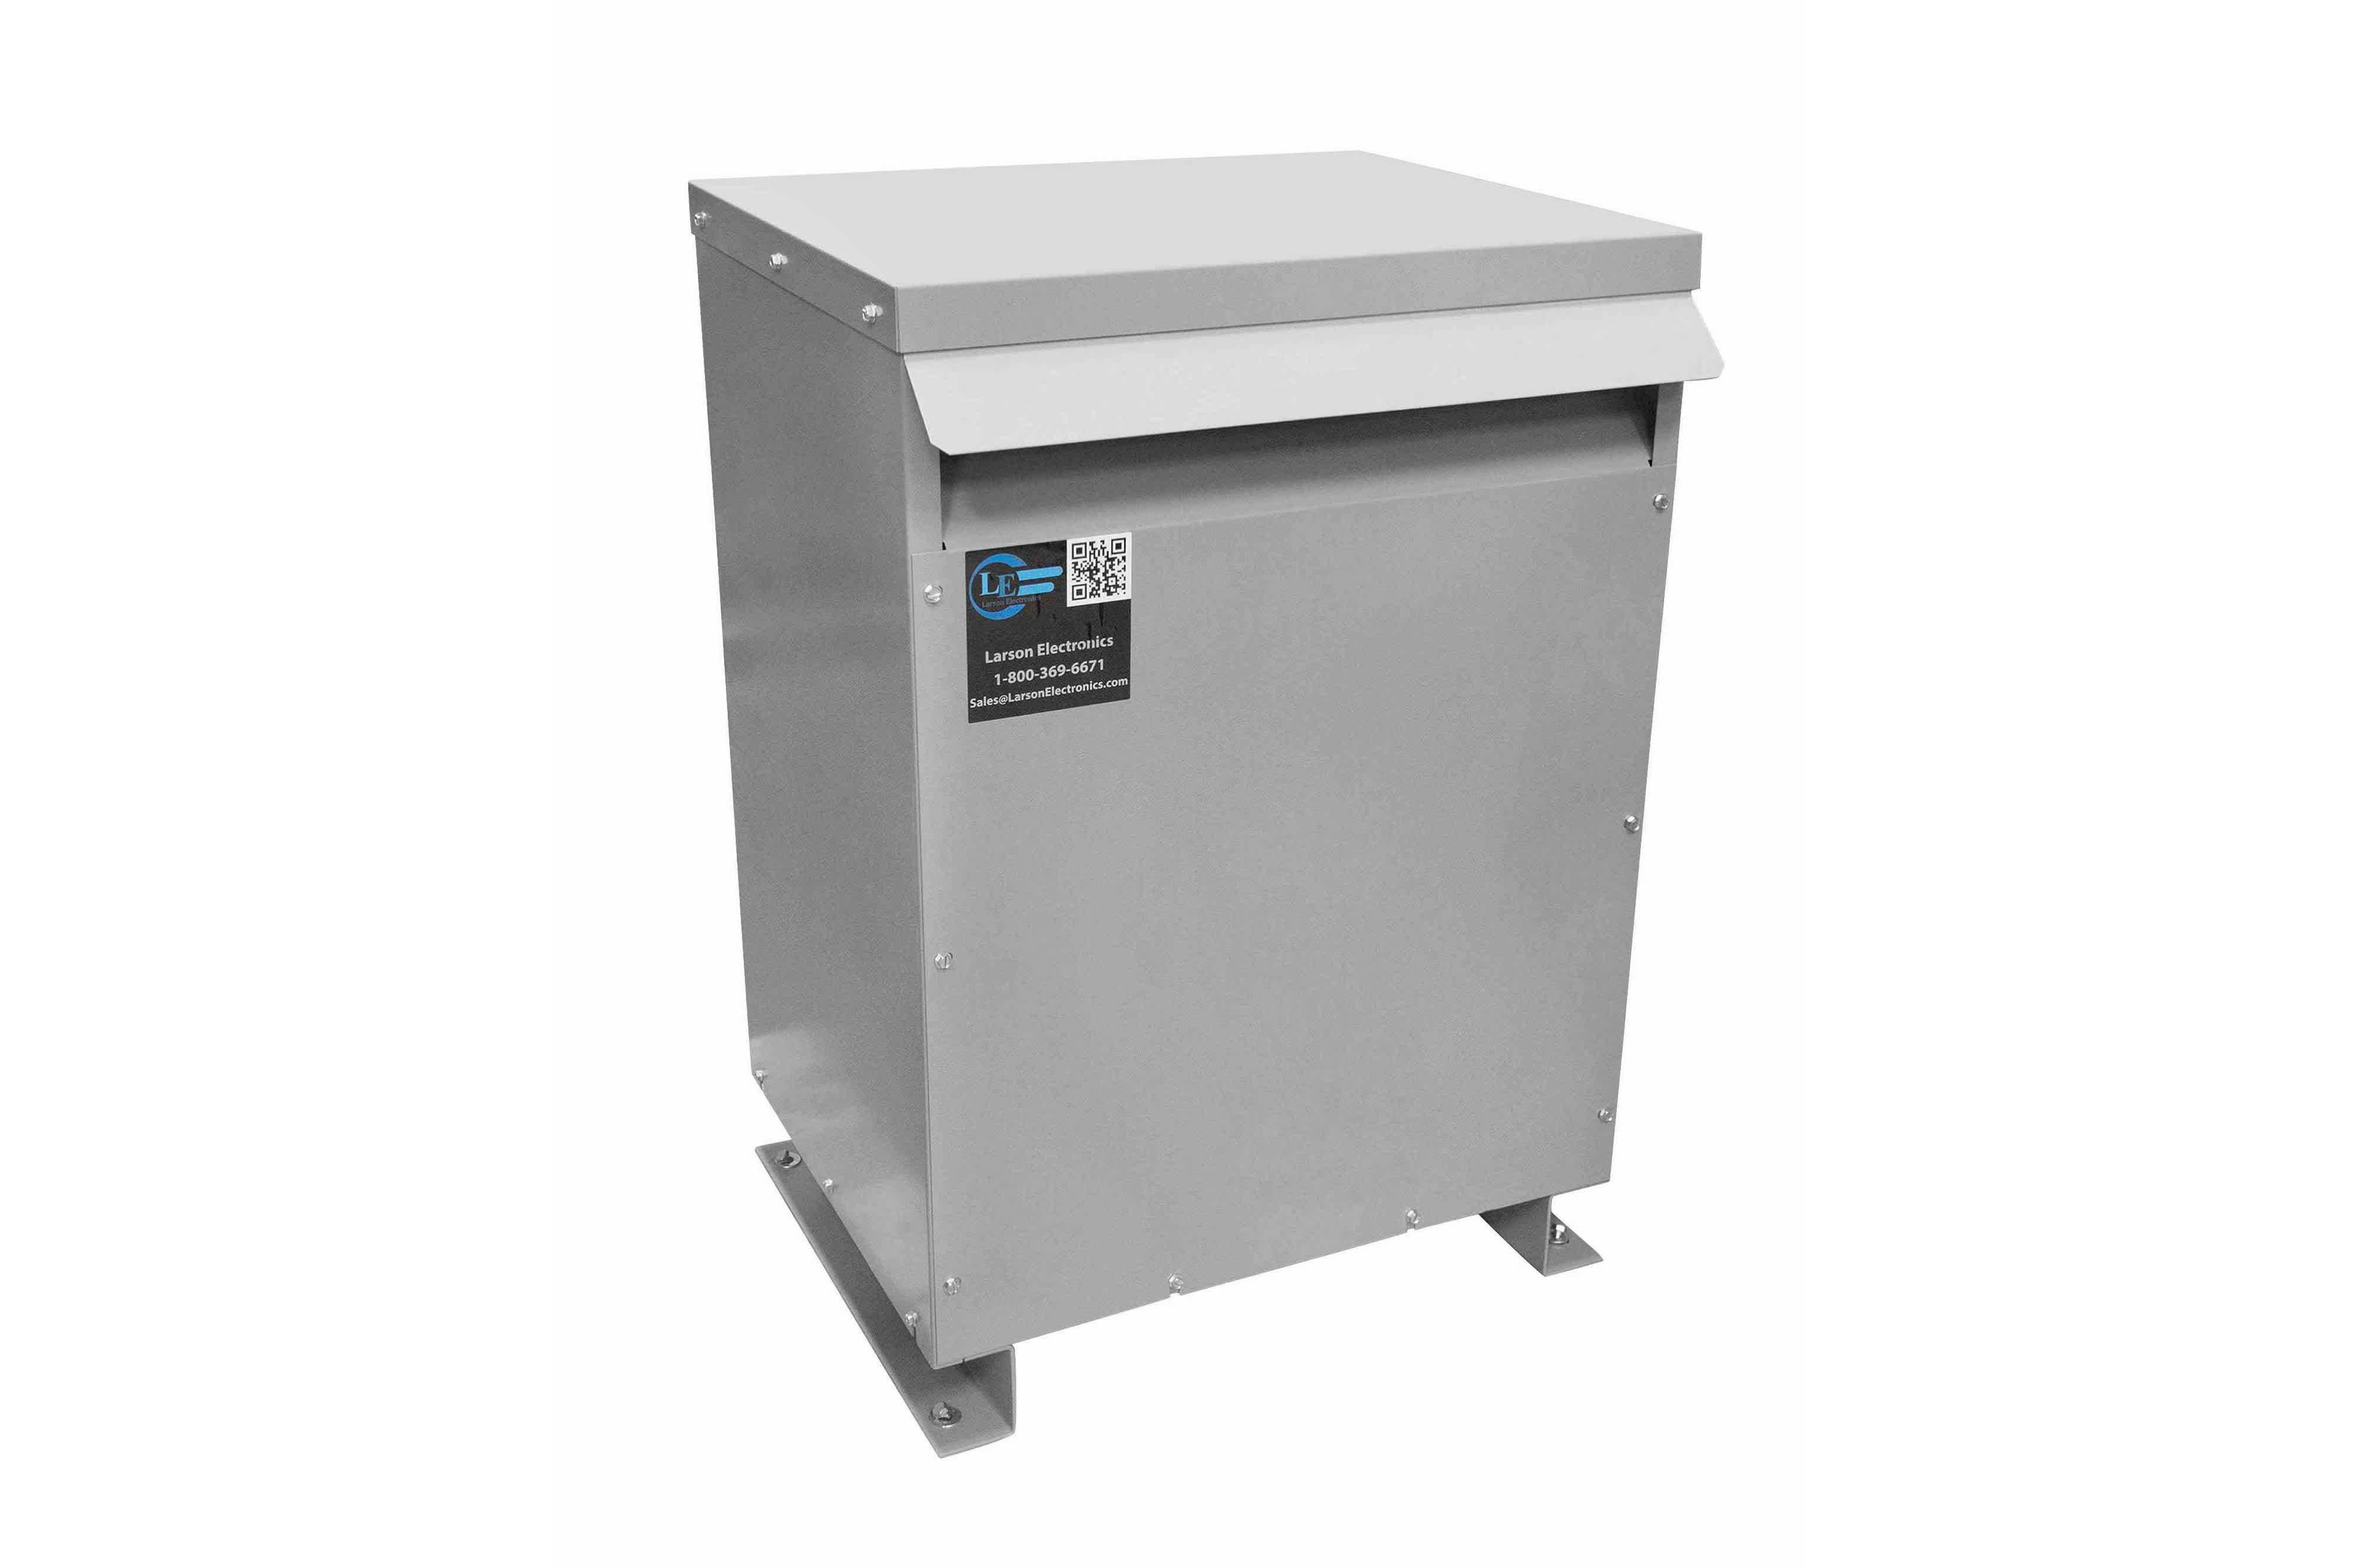 32.5 kVA 3PH Isolation Transformer, 208V Wye Primary, 415V Delta Secondary, N3R, Ventilated, 60 Hz